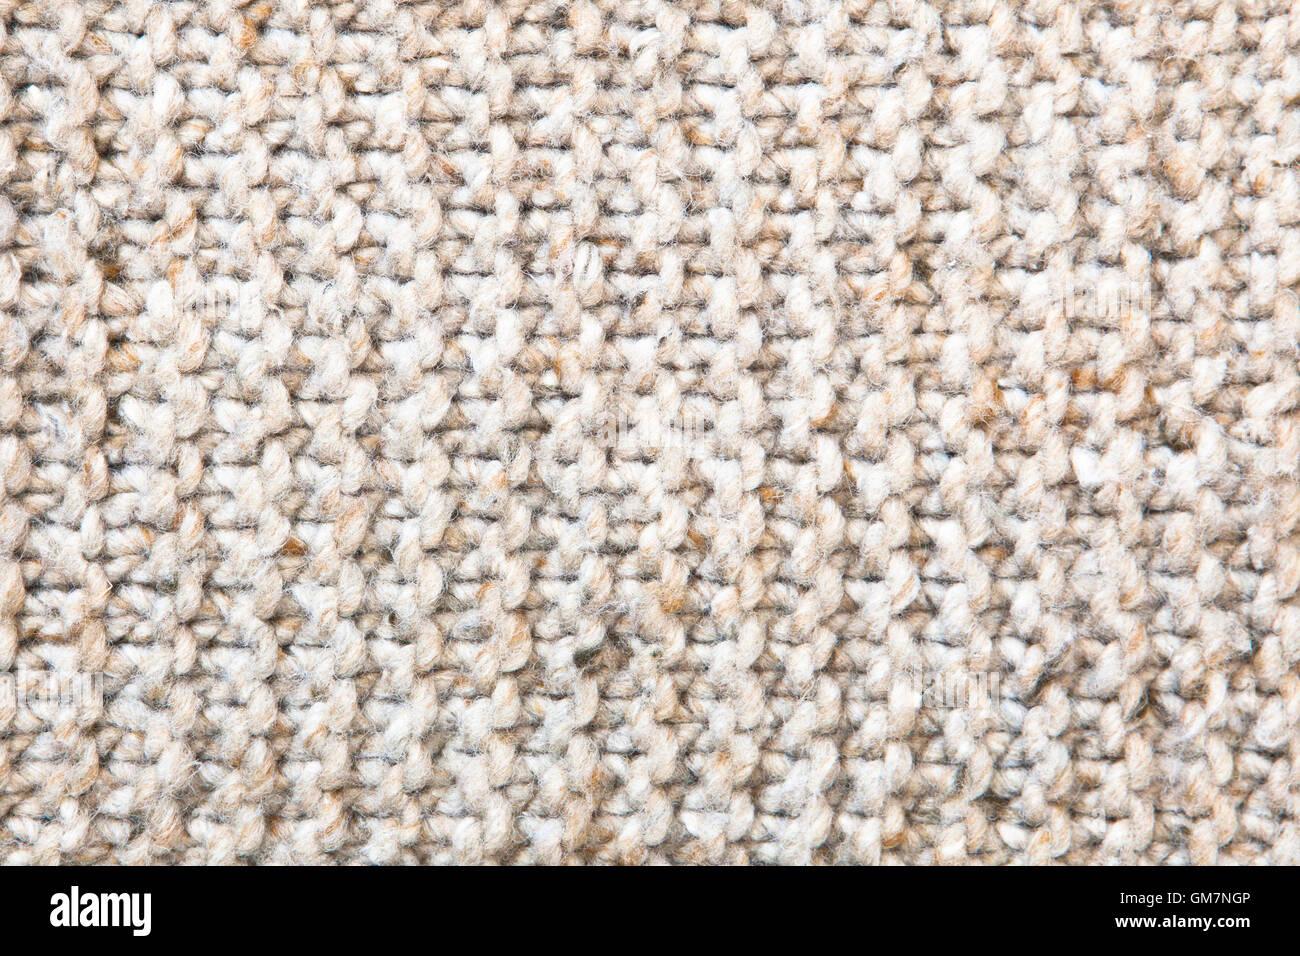 Wool background - Stock Image